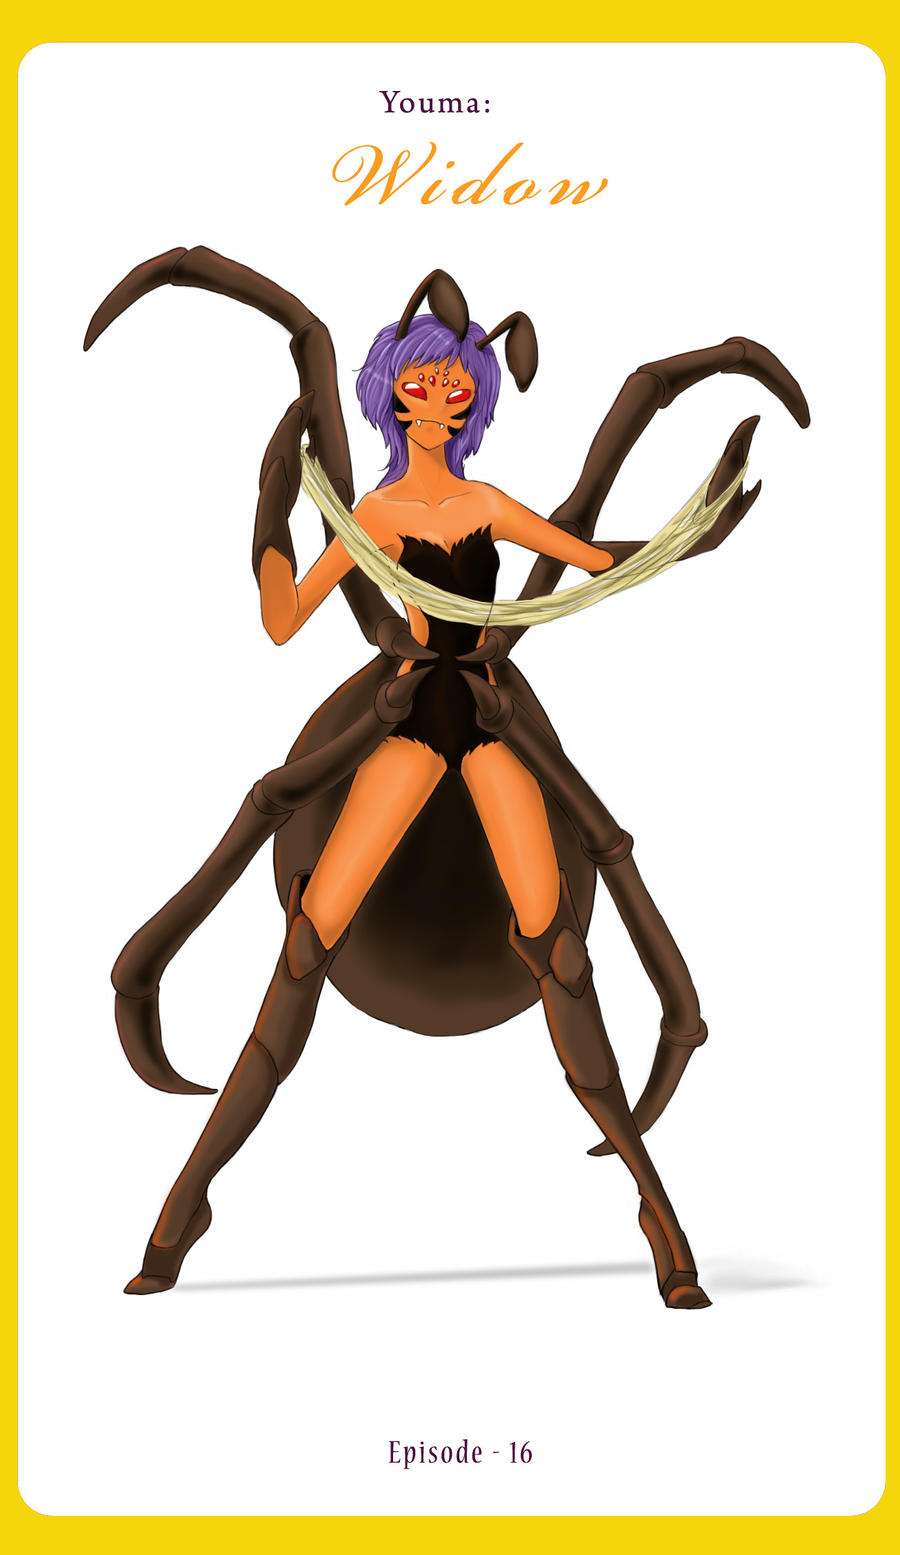 http://fc05.deviantart.net/fs23/i/2008/006/4/6/Page_17___Widow_by_Dark_elfa.jpg